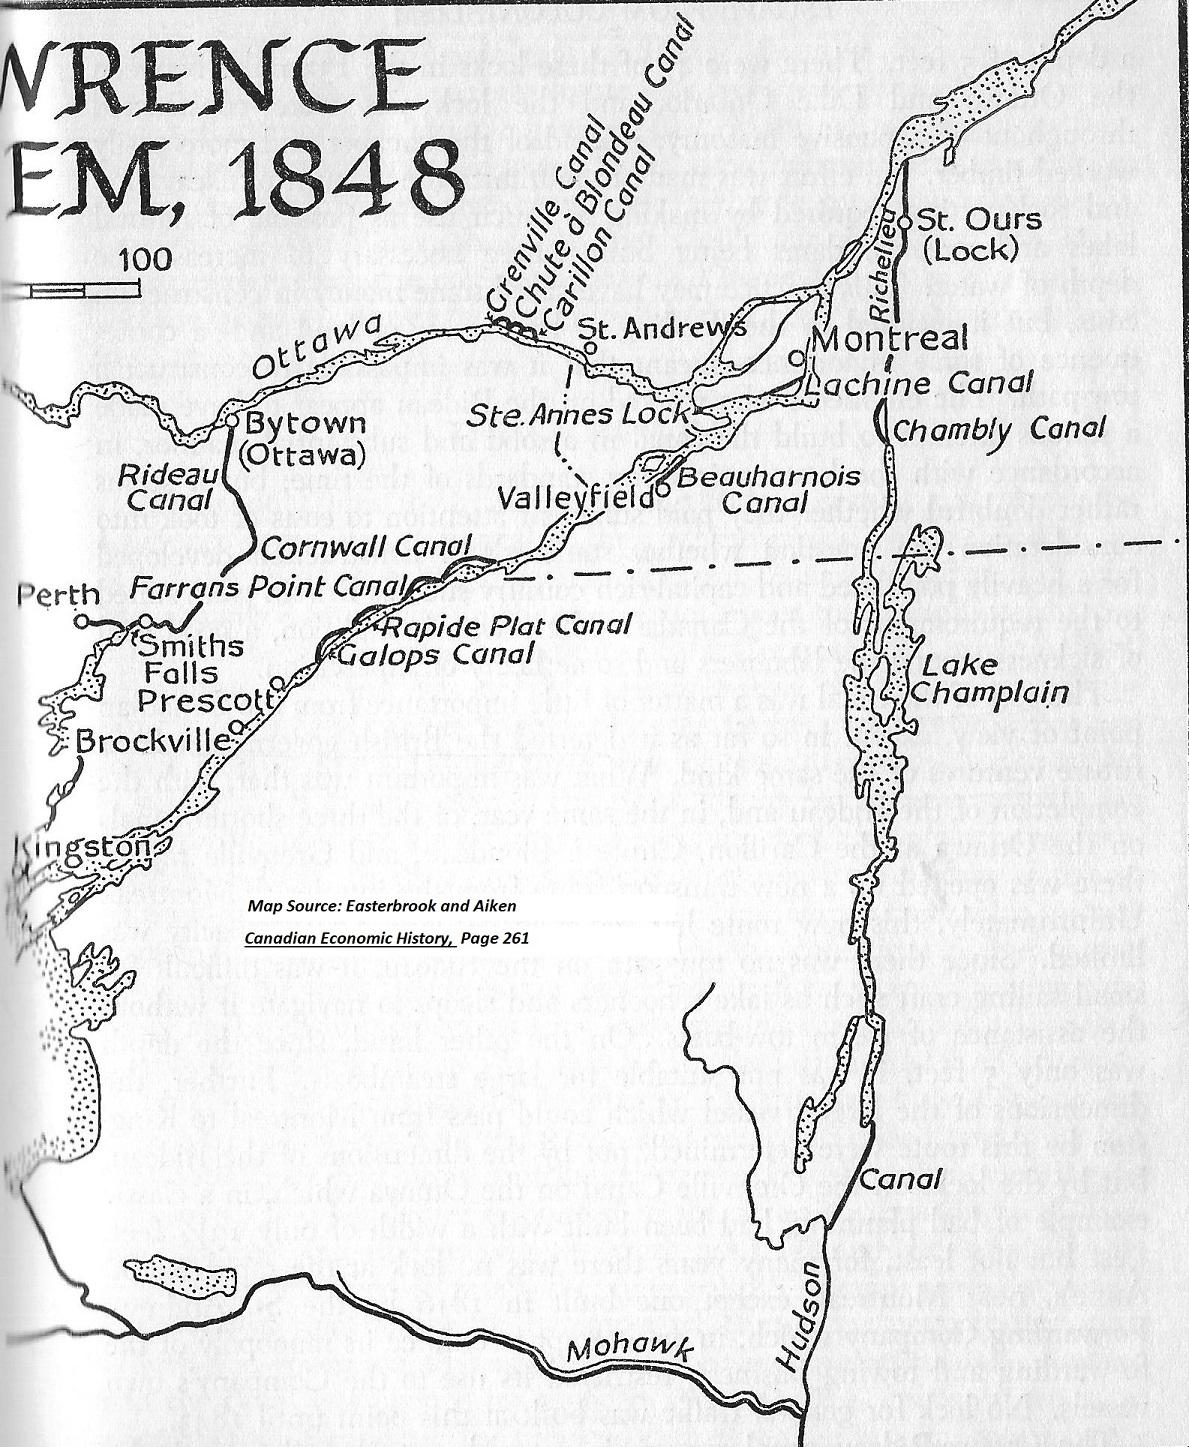 canaltrianglein1848